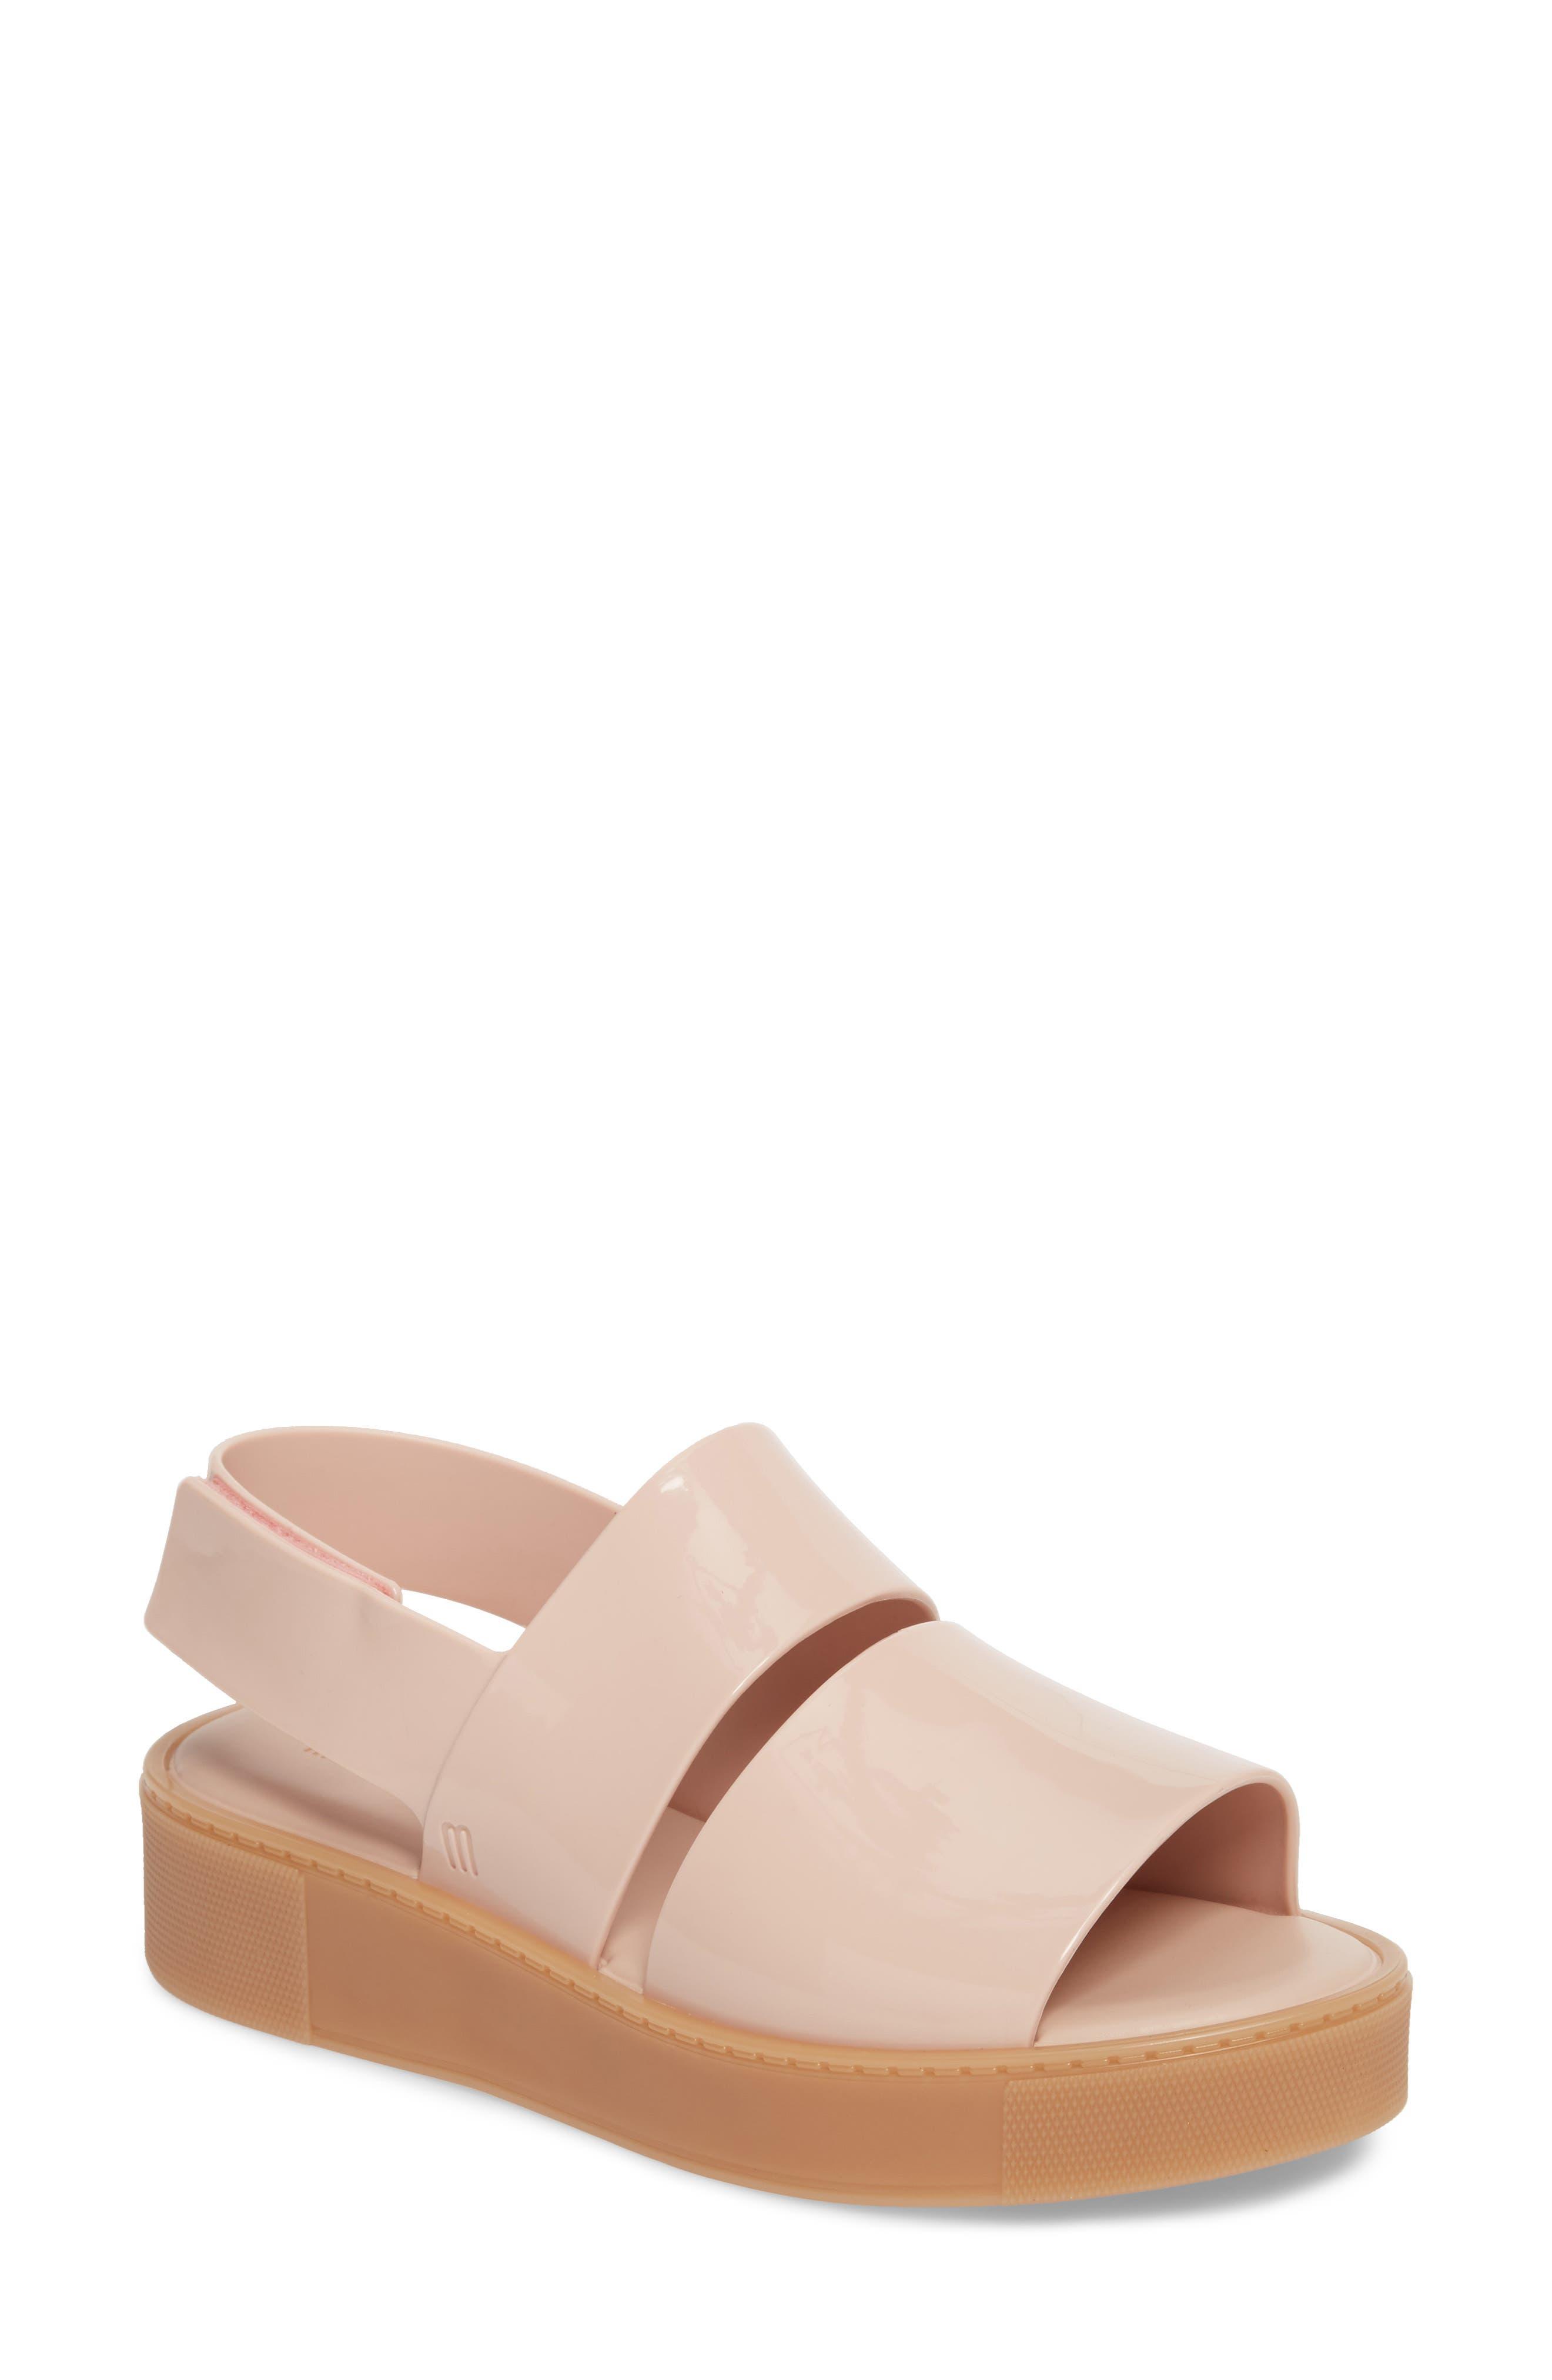 Soho Platform Sandal,                             Main thumbnail 2, color,